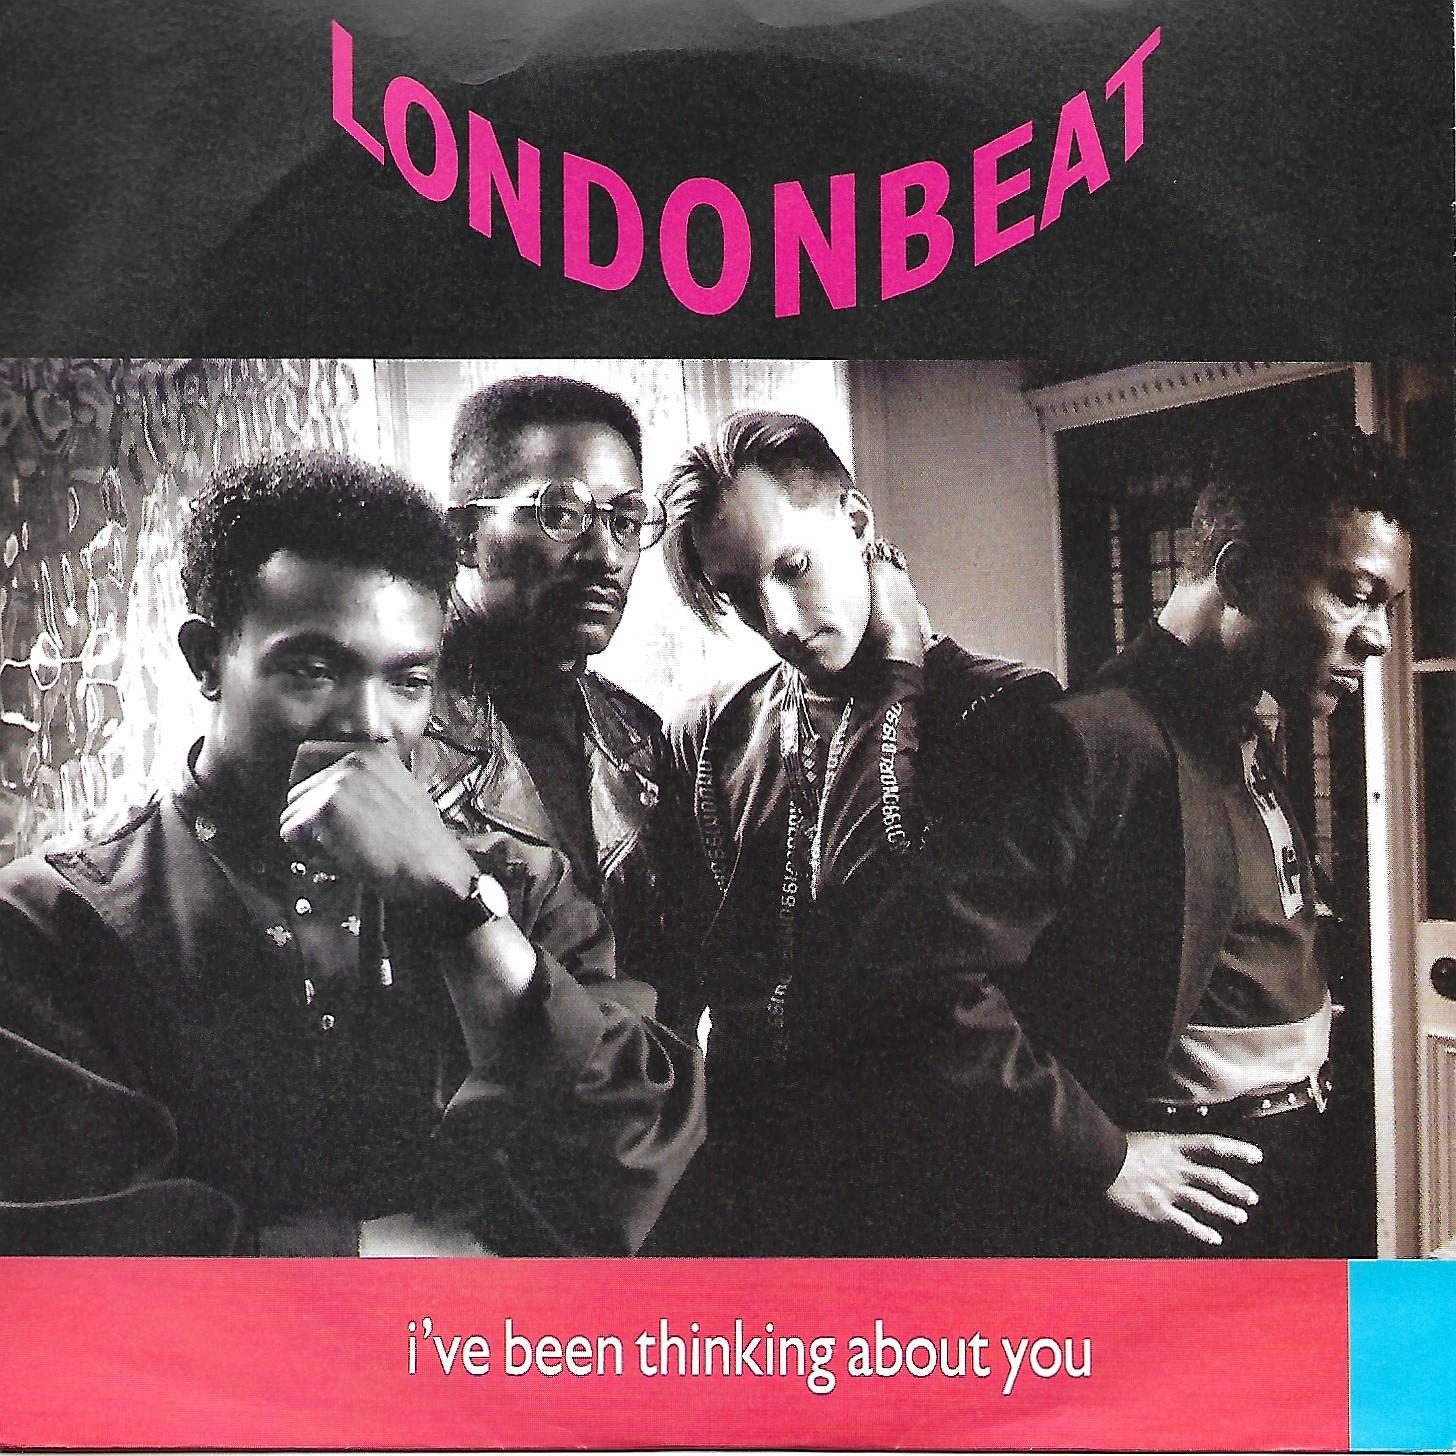 londonbeat_ivebeenthinkingaboutyou